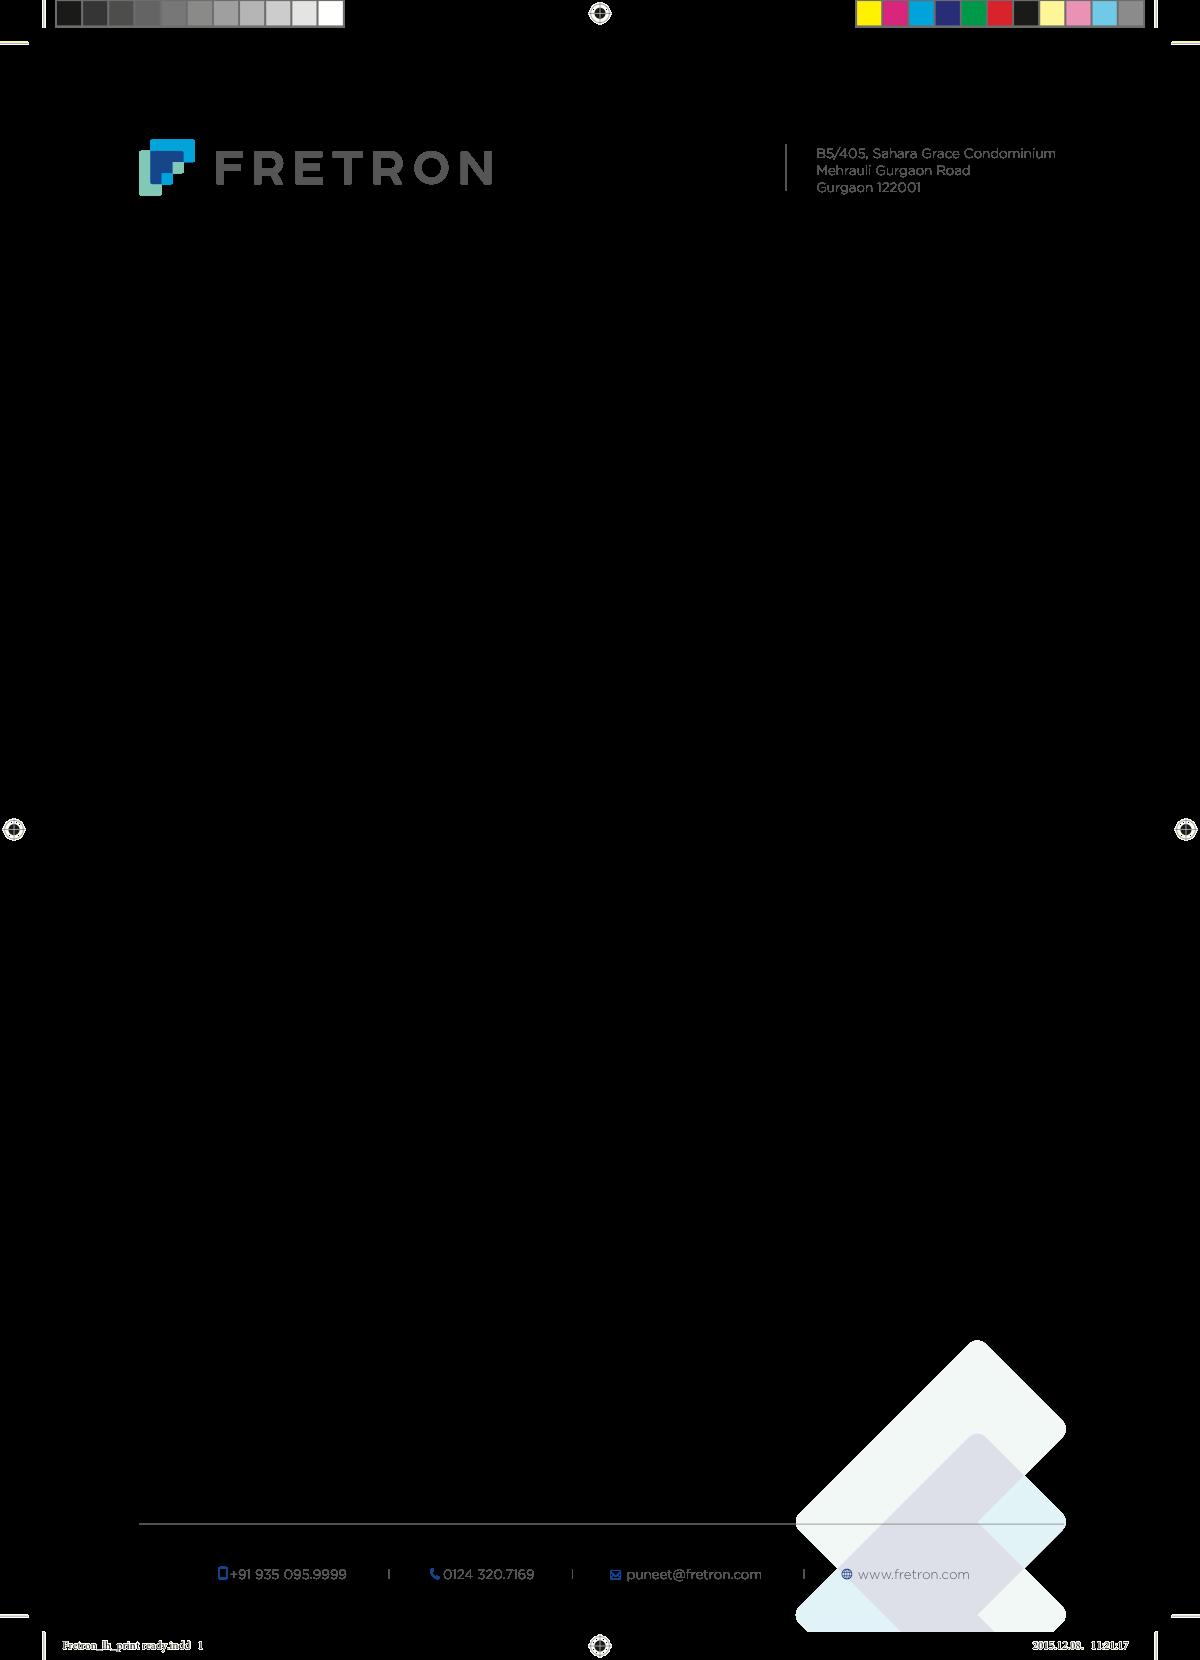 stationary and other design tasks for fretron.com